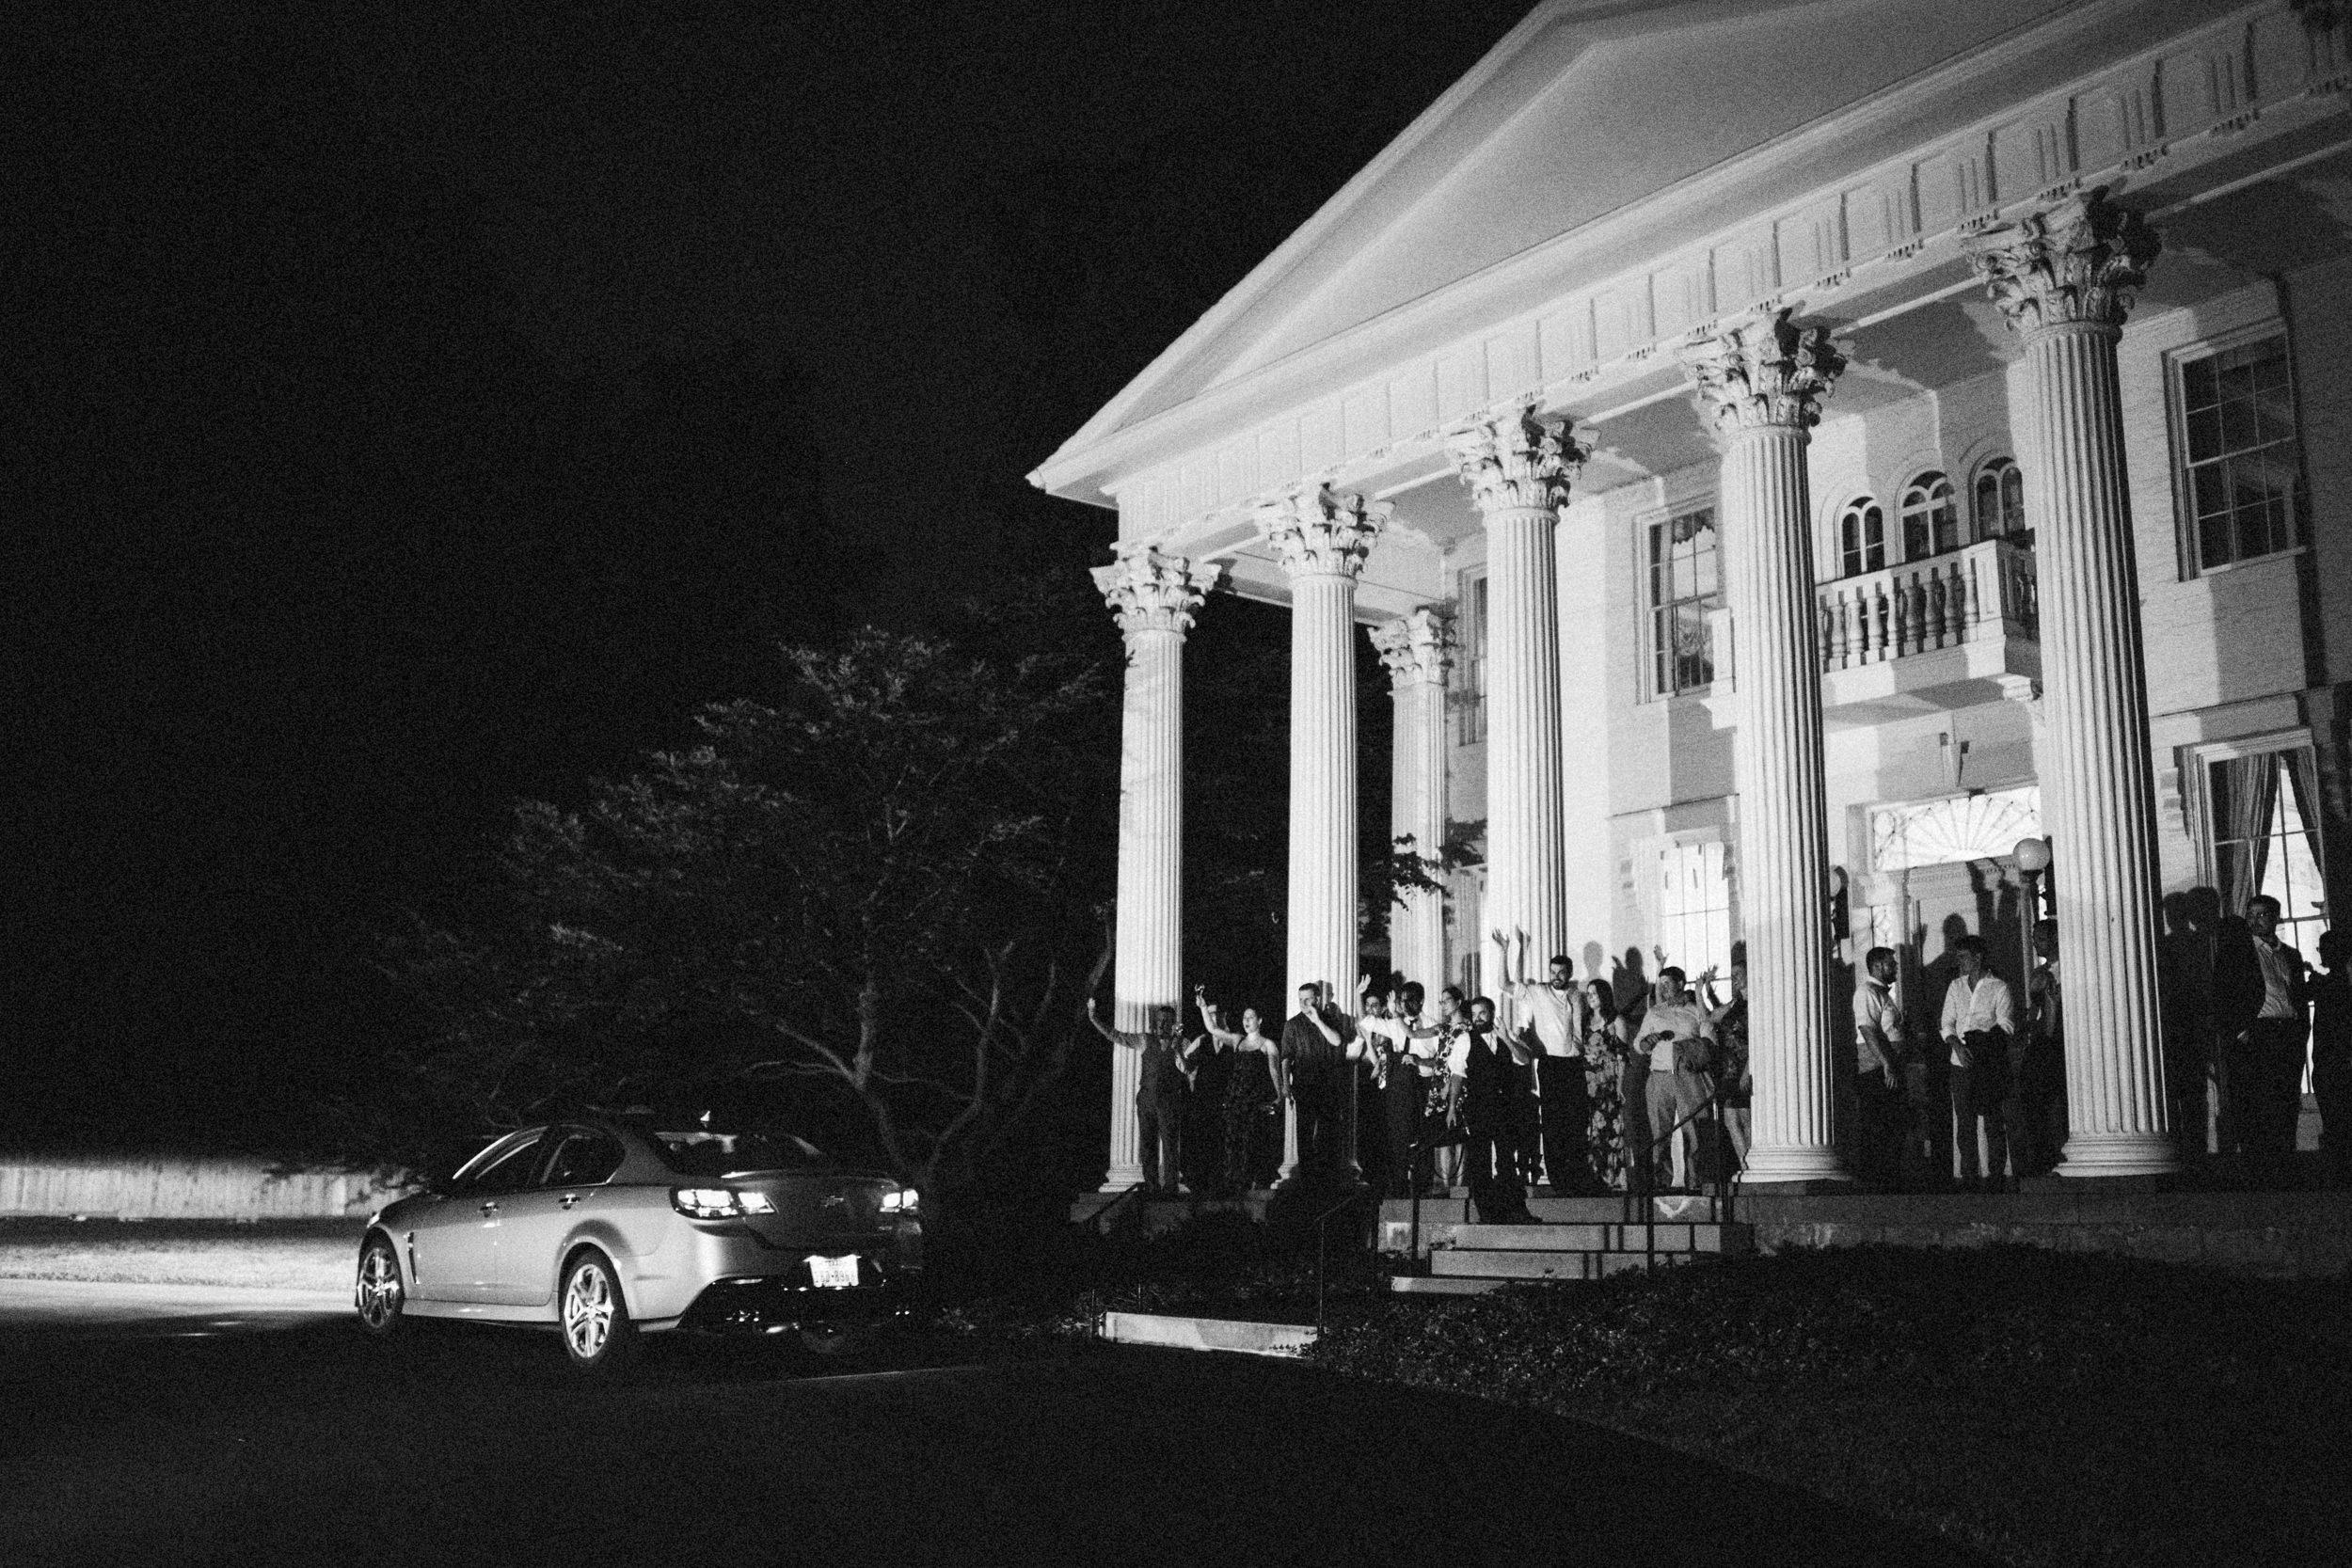 Louisville-Kentucky-Wedding-Elopement-Photographer-Sarah-Katherine-Davis-Photography-Whitehall-Classic-Timeless-Garden-Wedding-895.jpg